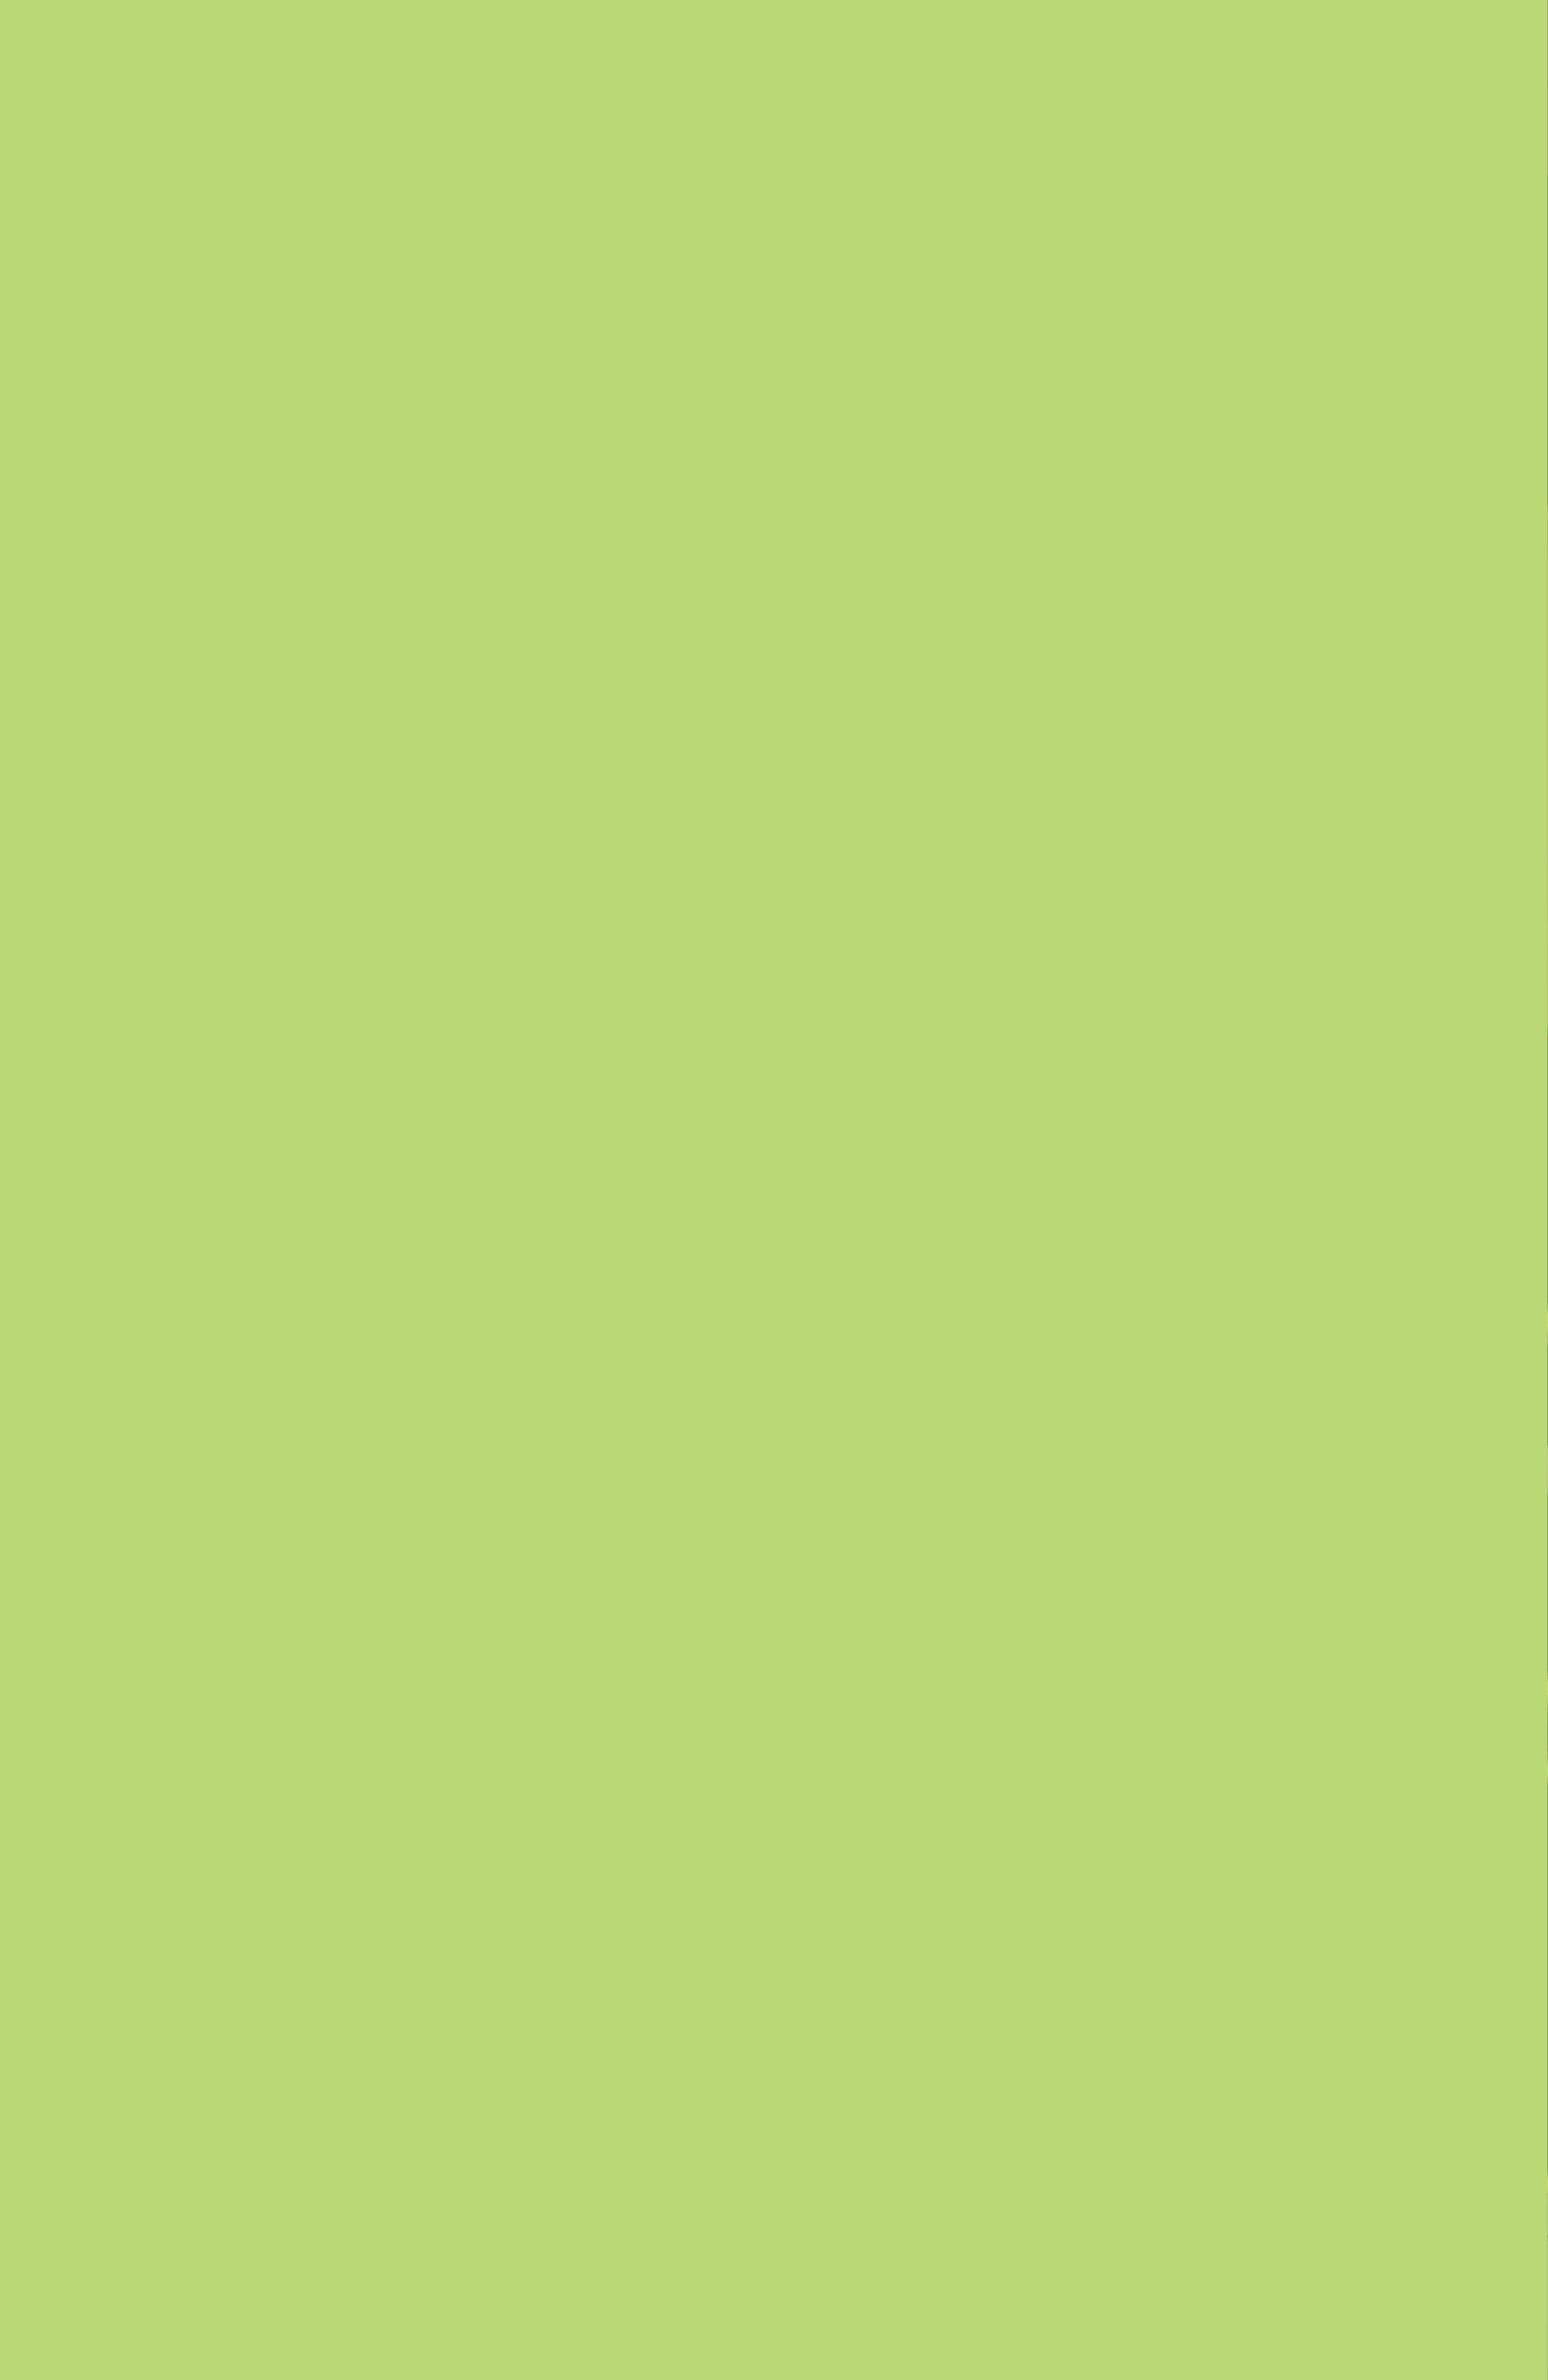 Pef-K3tWYcy #1 - English 157